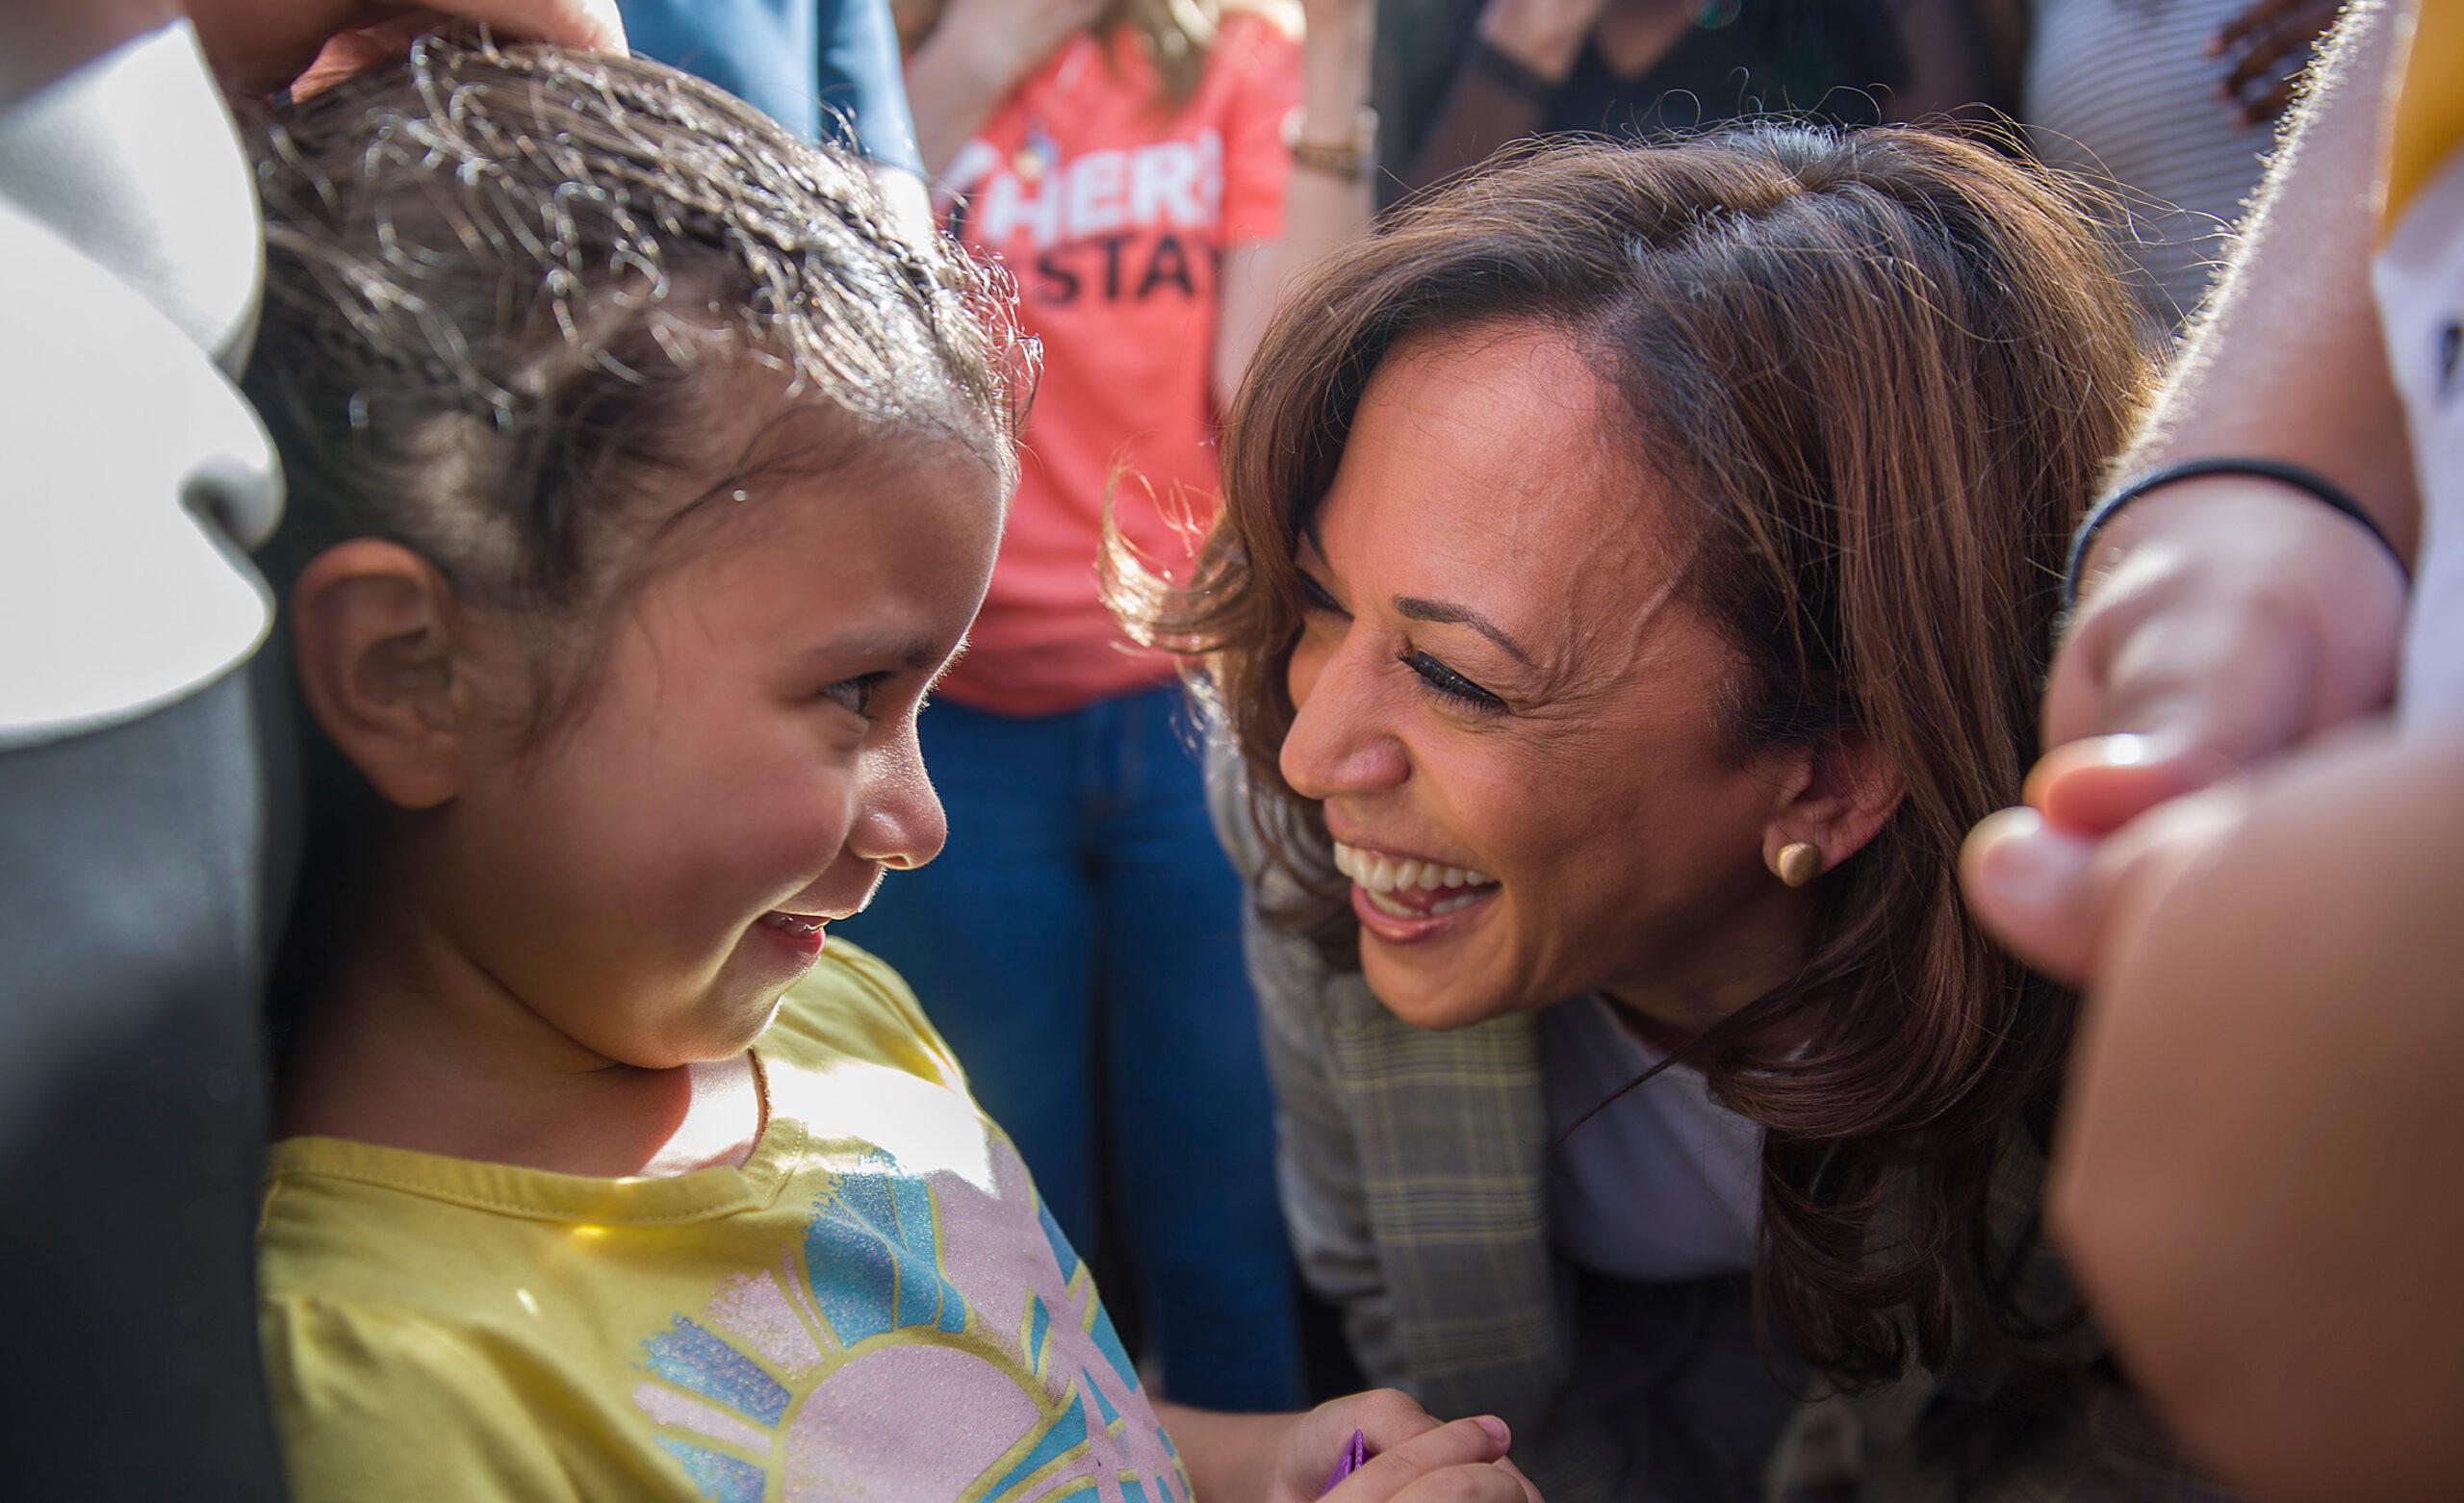 Then-Senator Kamala Harris on June 28, 2019 in Homestead, Florida. Joe Raedle/Getty Images.